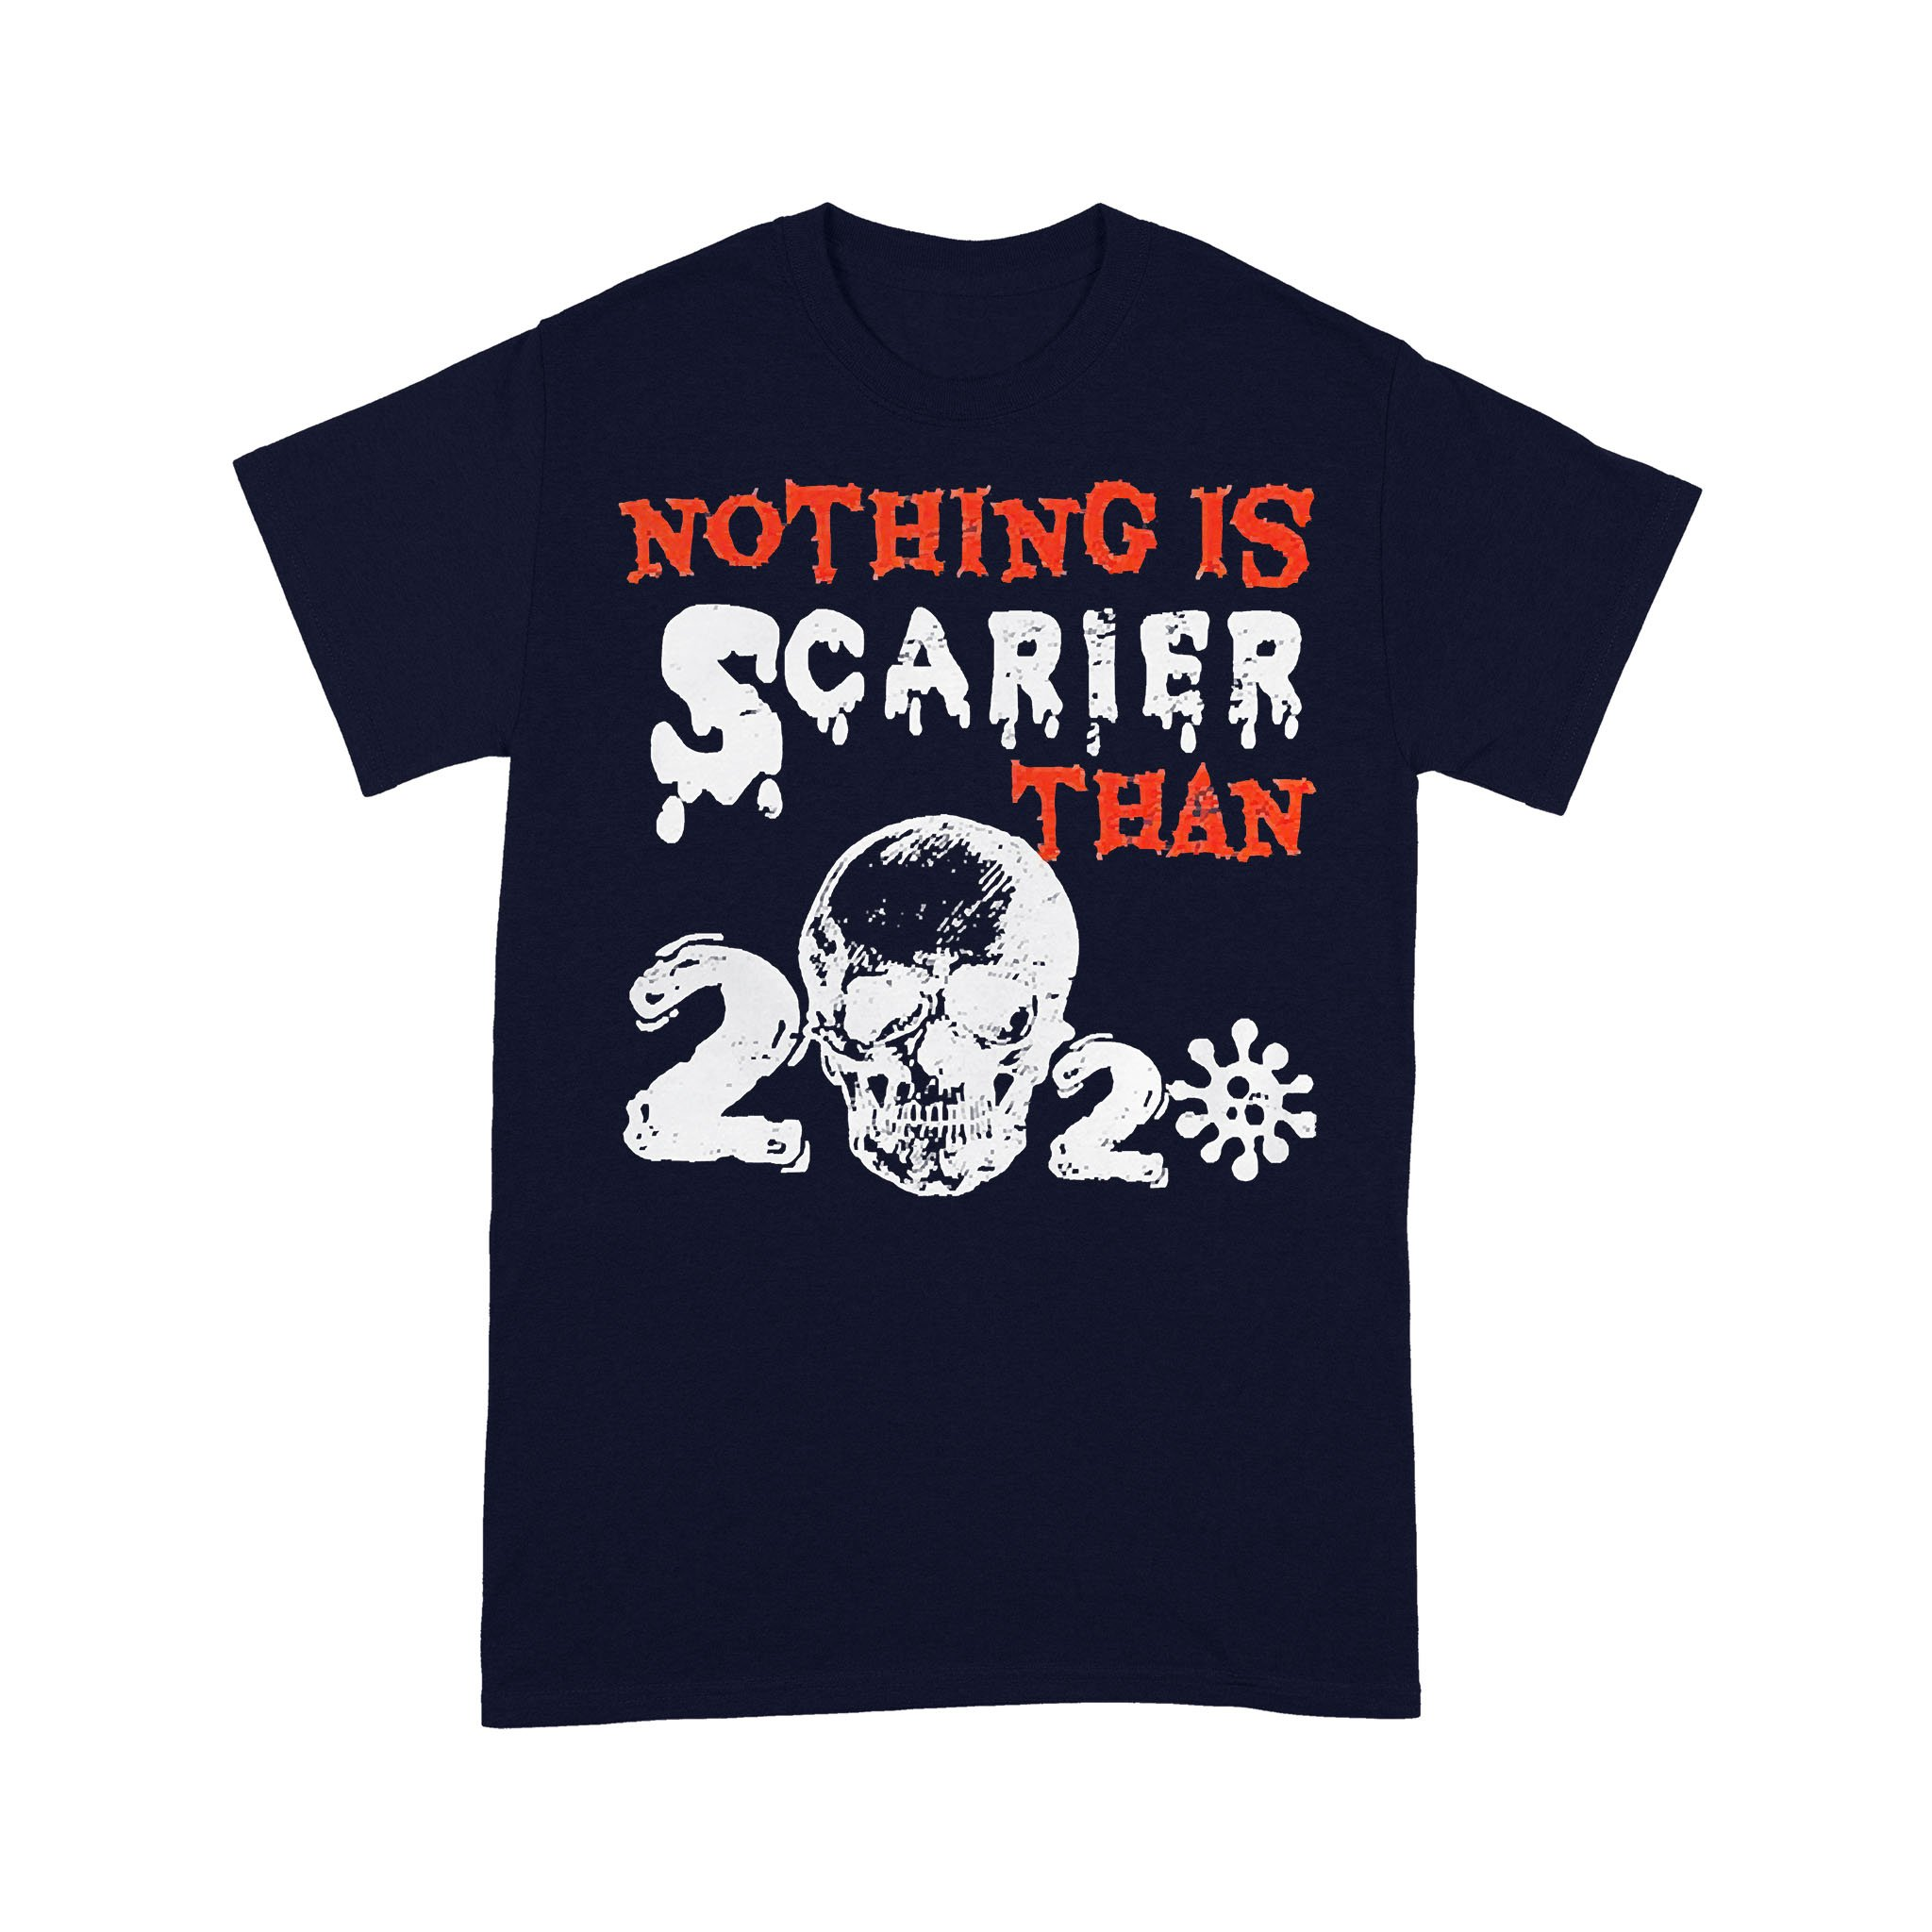 Nothing Is Scarier Than 2020 Coronavirus T-shirt